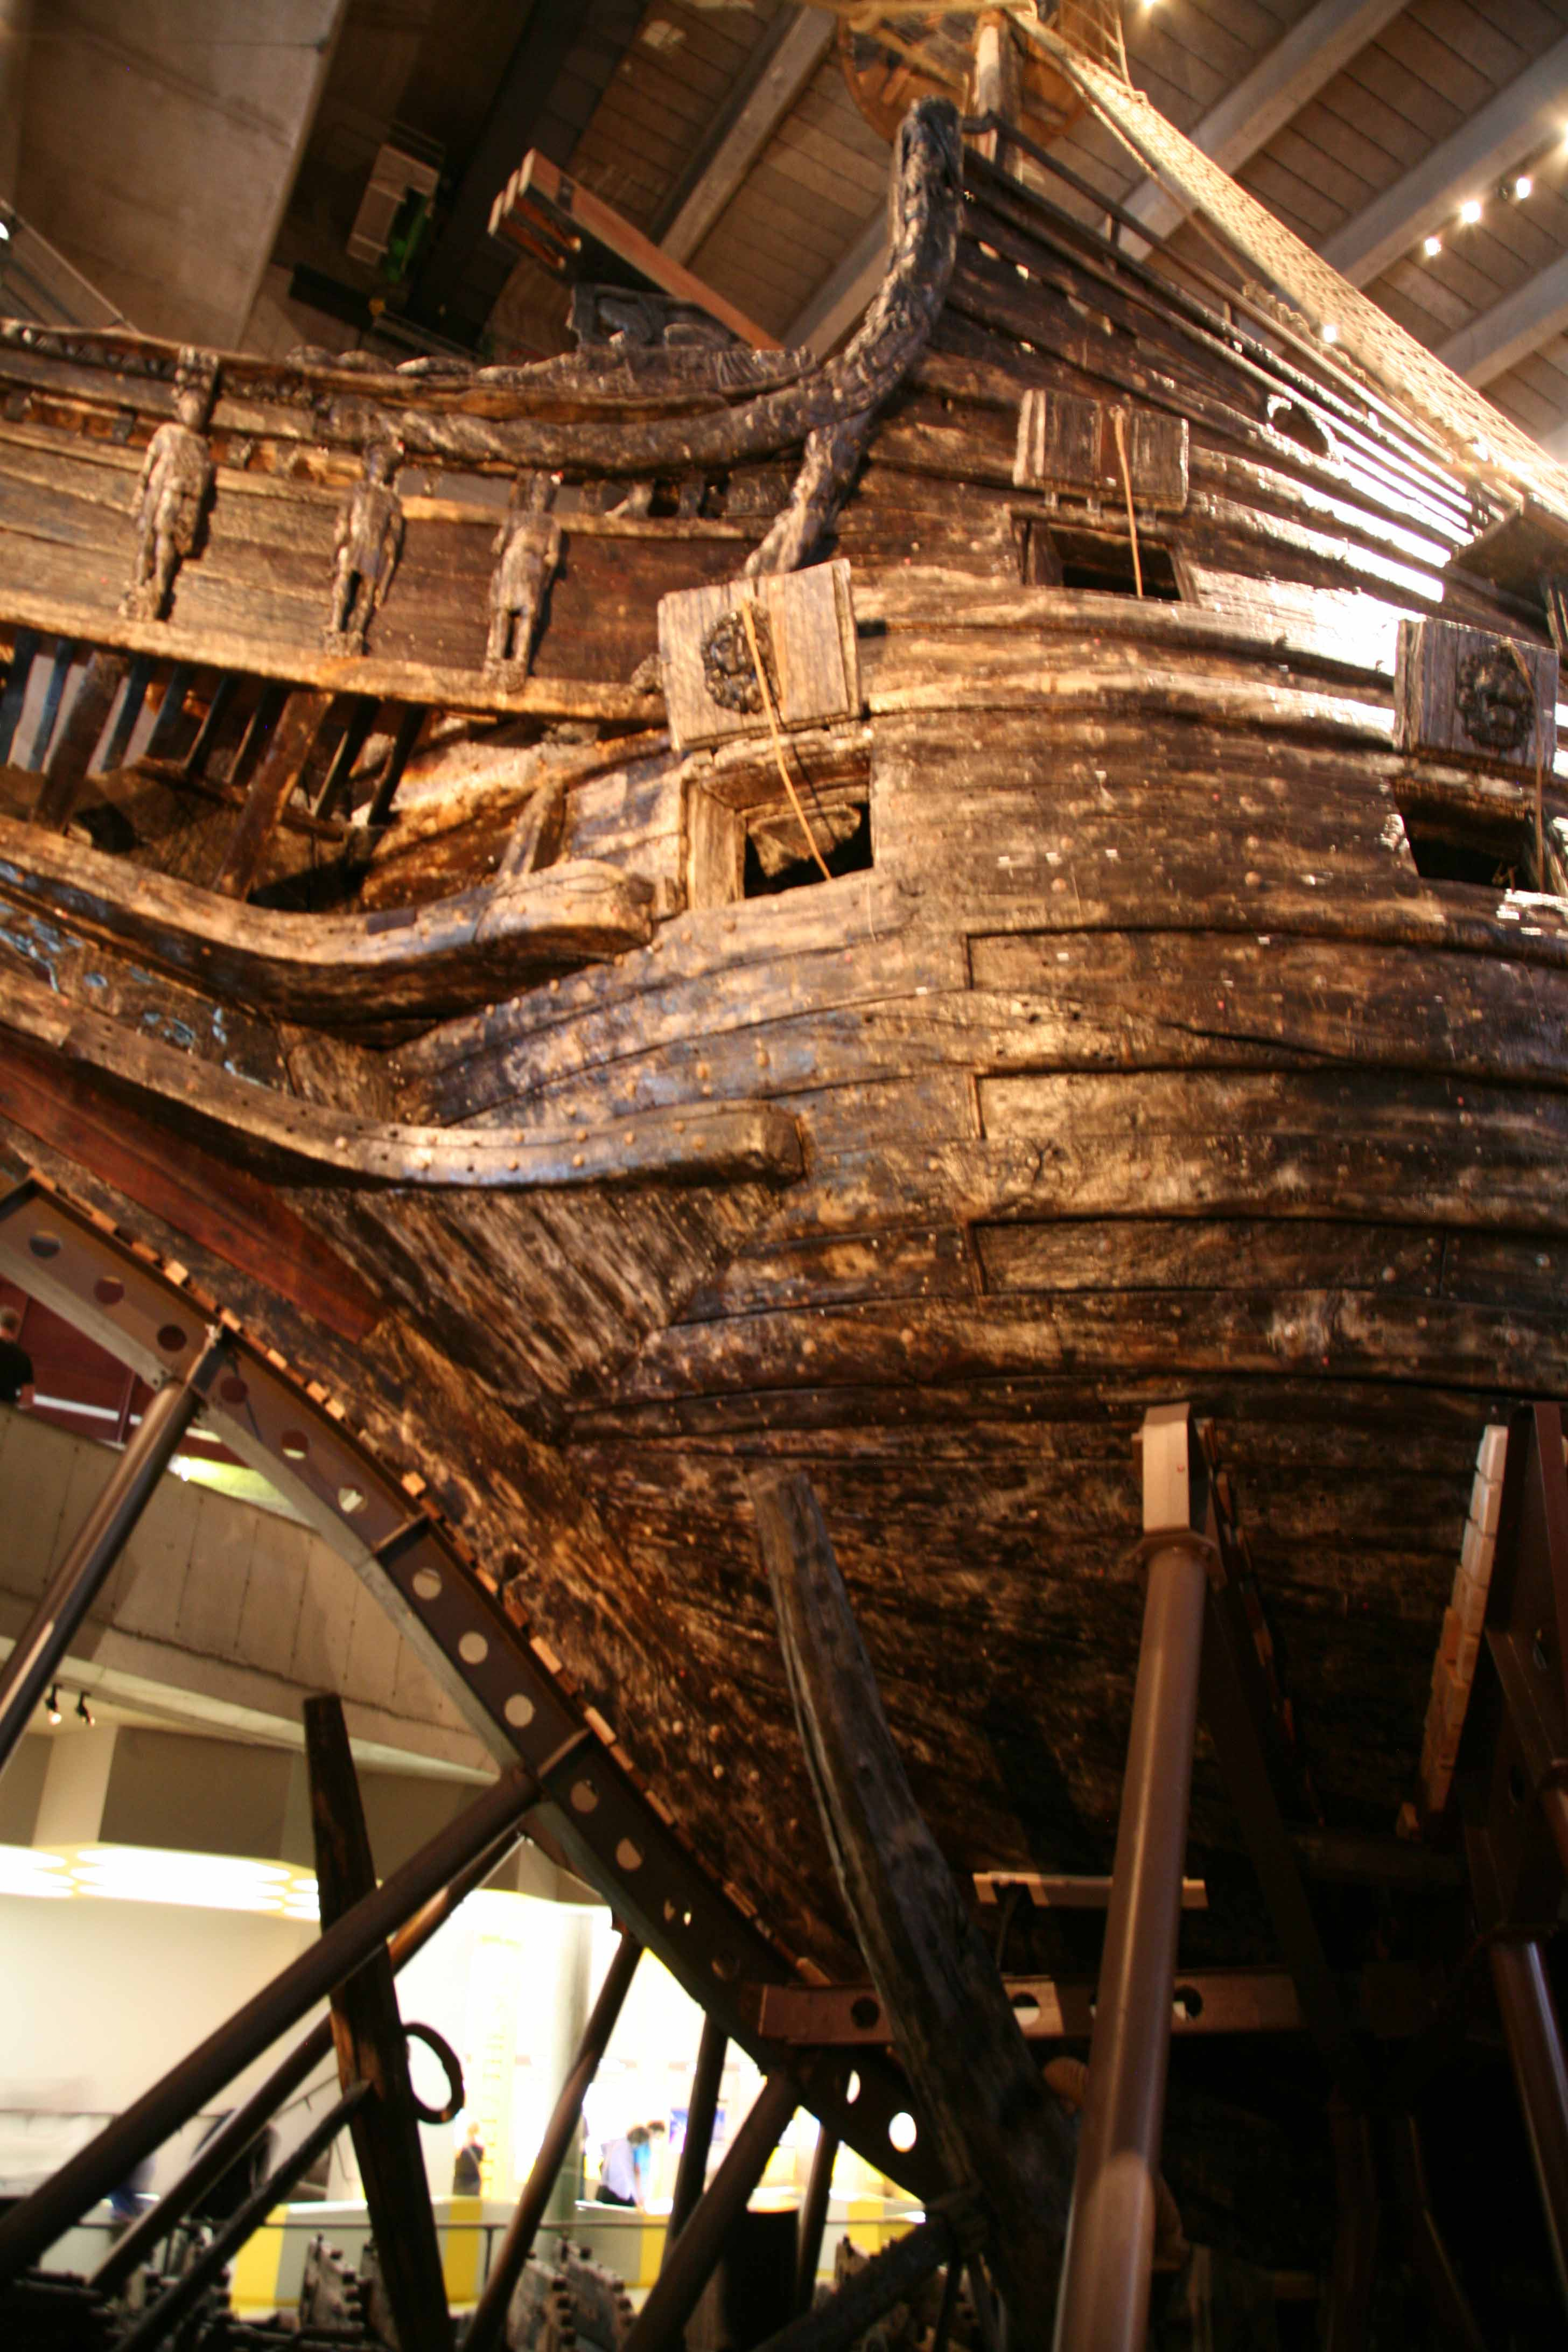 Photos of Vasa ship in the Vasa museum Stockholm